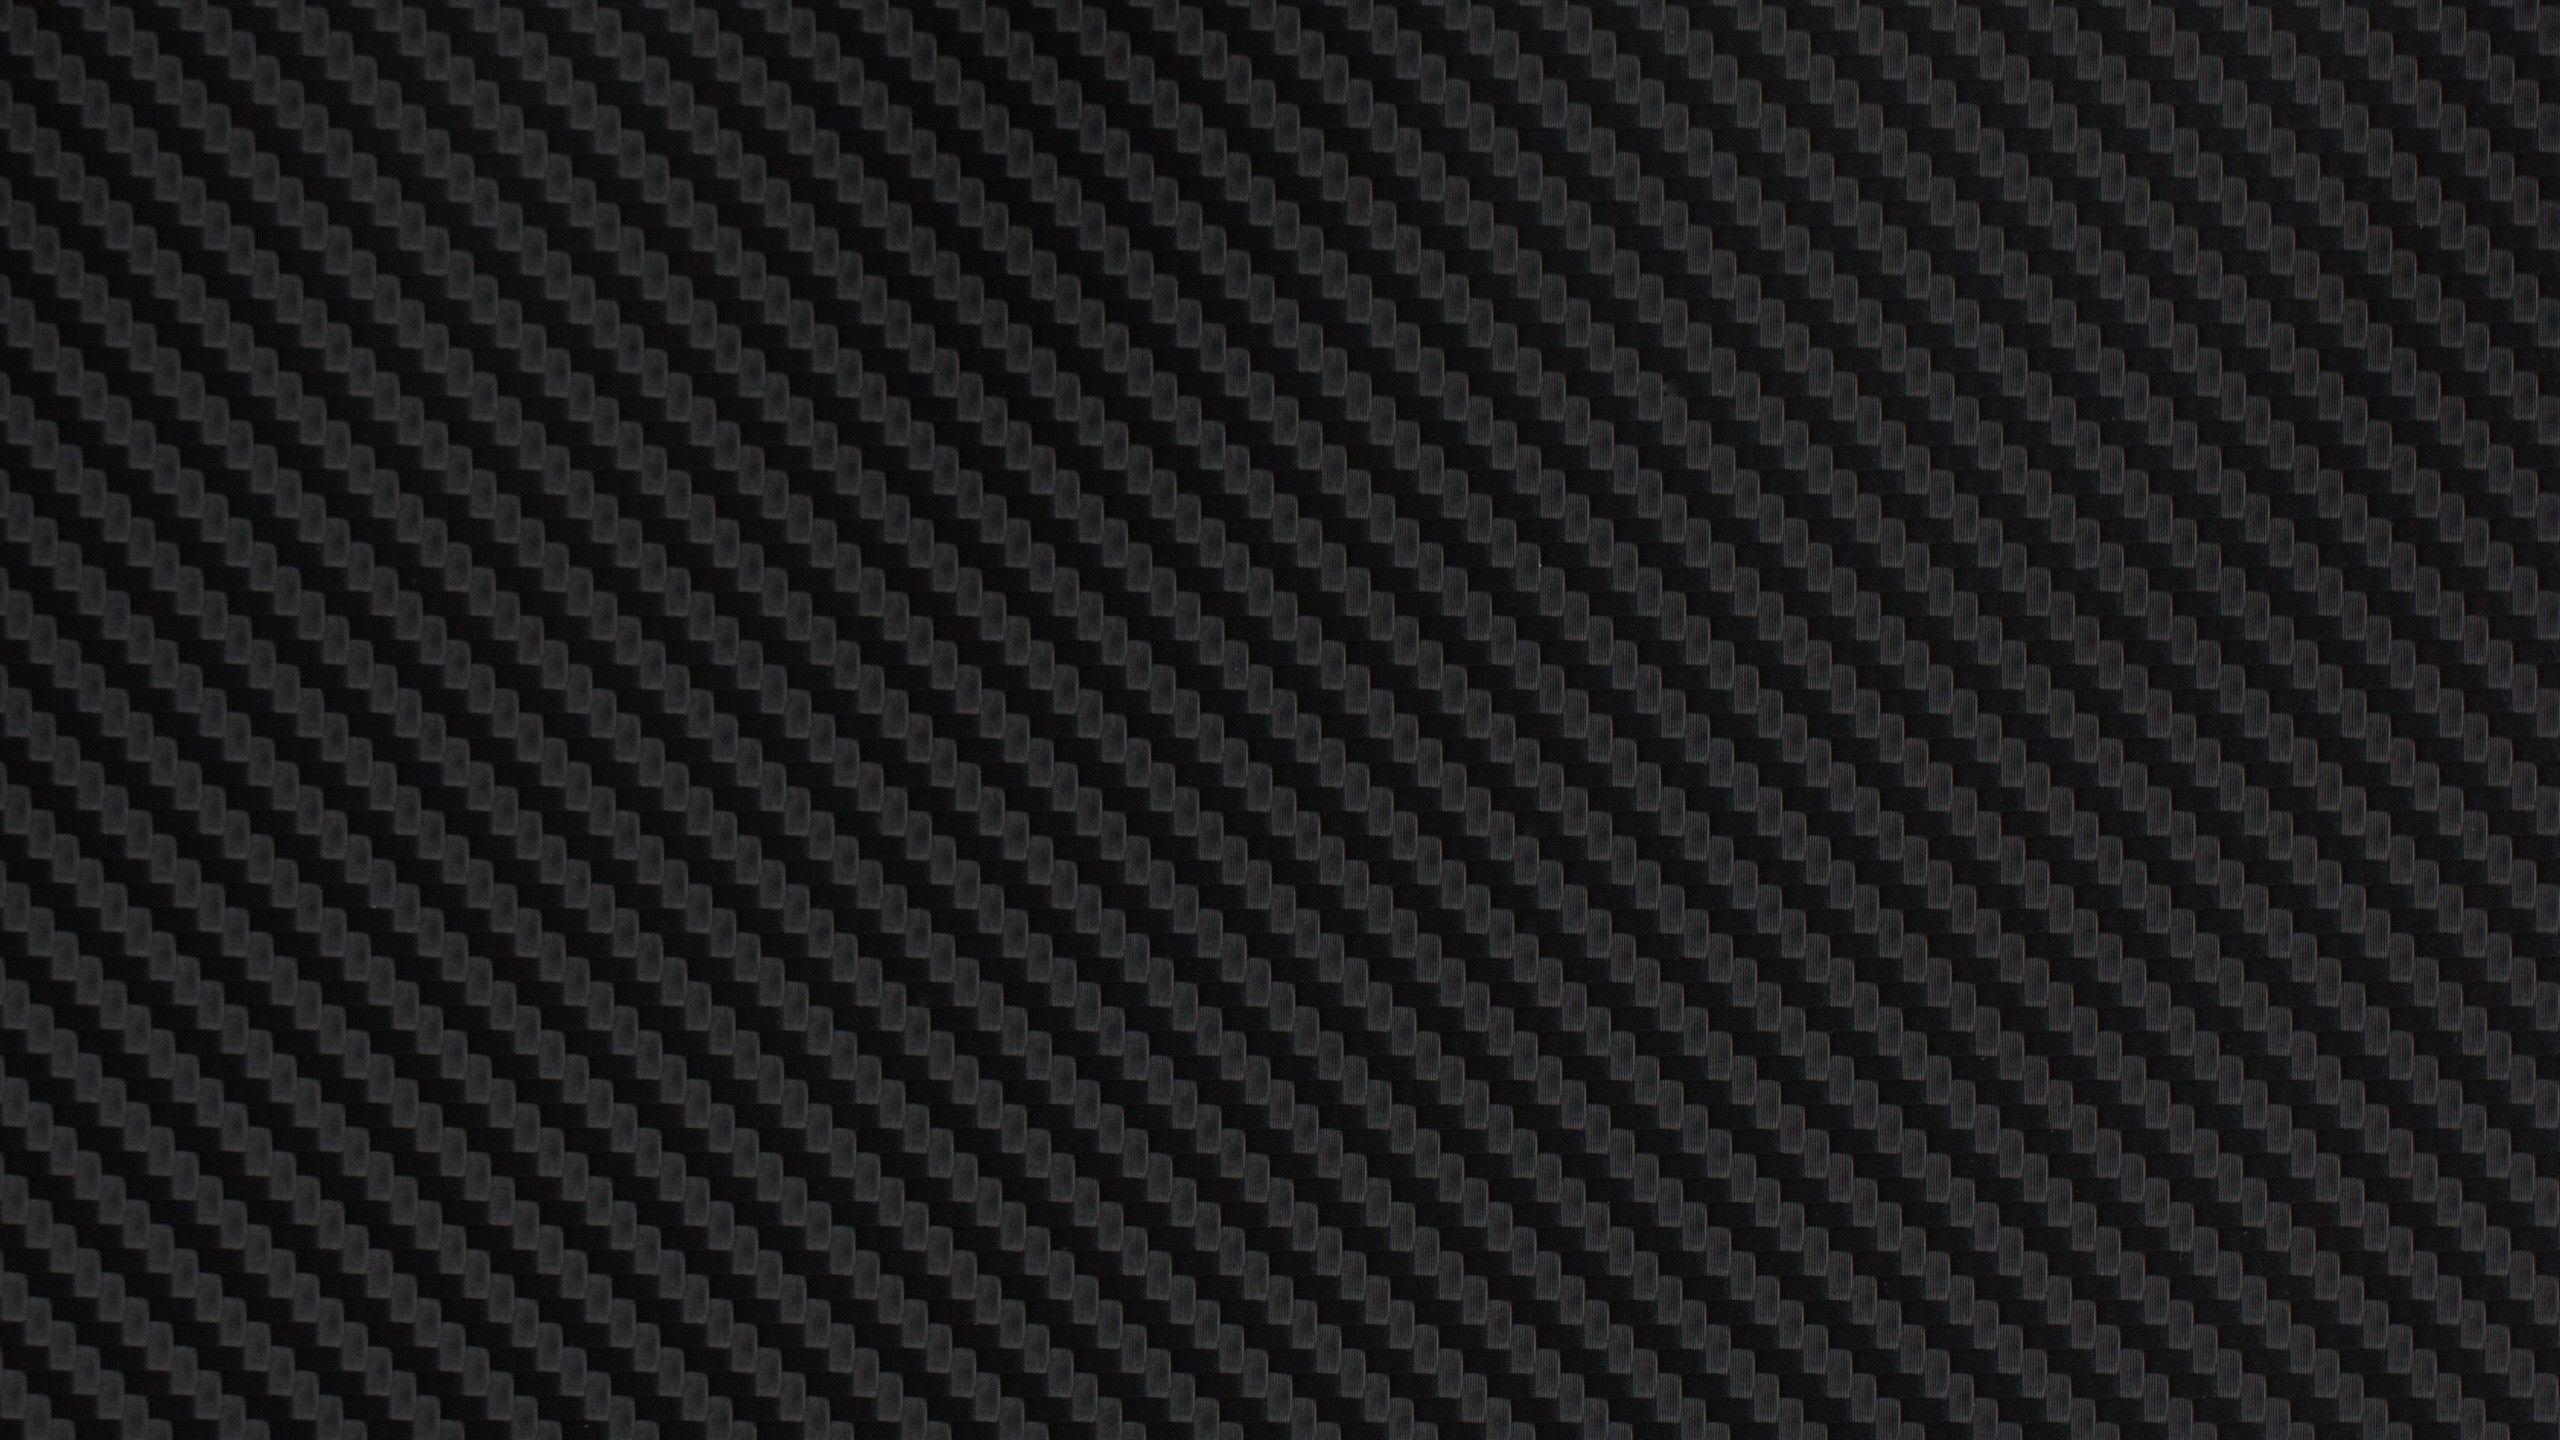 Carbon Fiber Hd Wallpapers Top Free Carbon Fiber Hd Backgrounds Wallpaperaccess